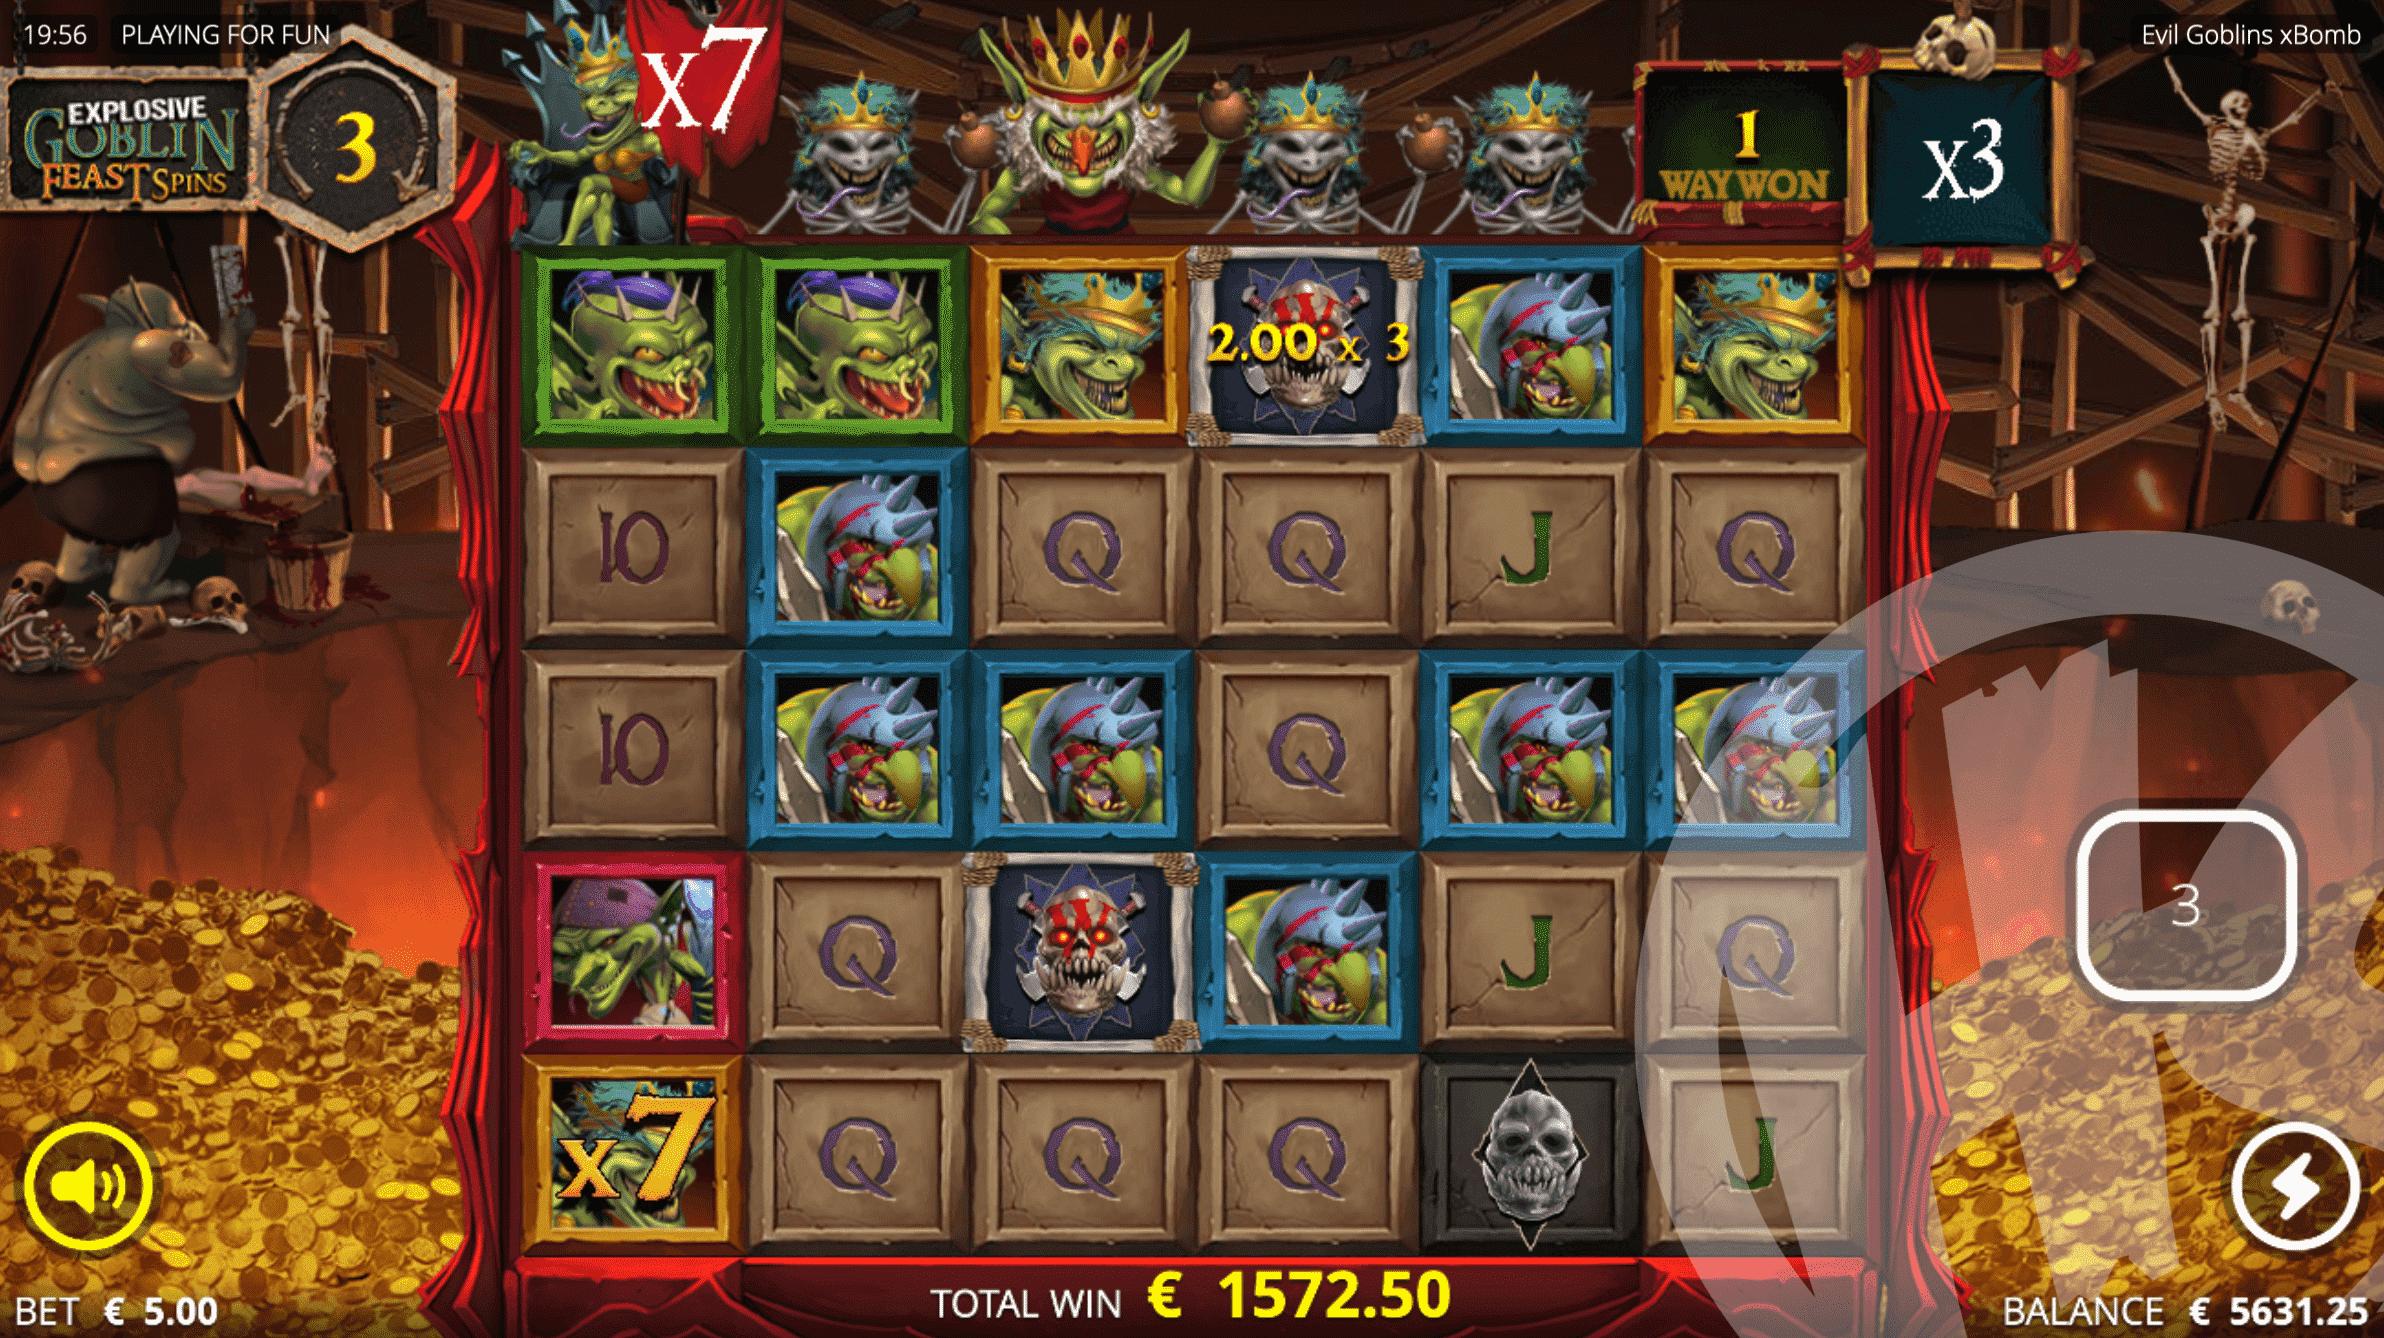 Evil Goblins xBomb Explosive Goblin Feast Spins